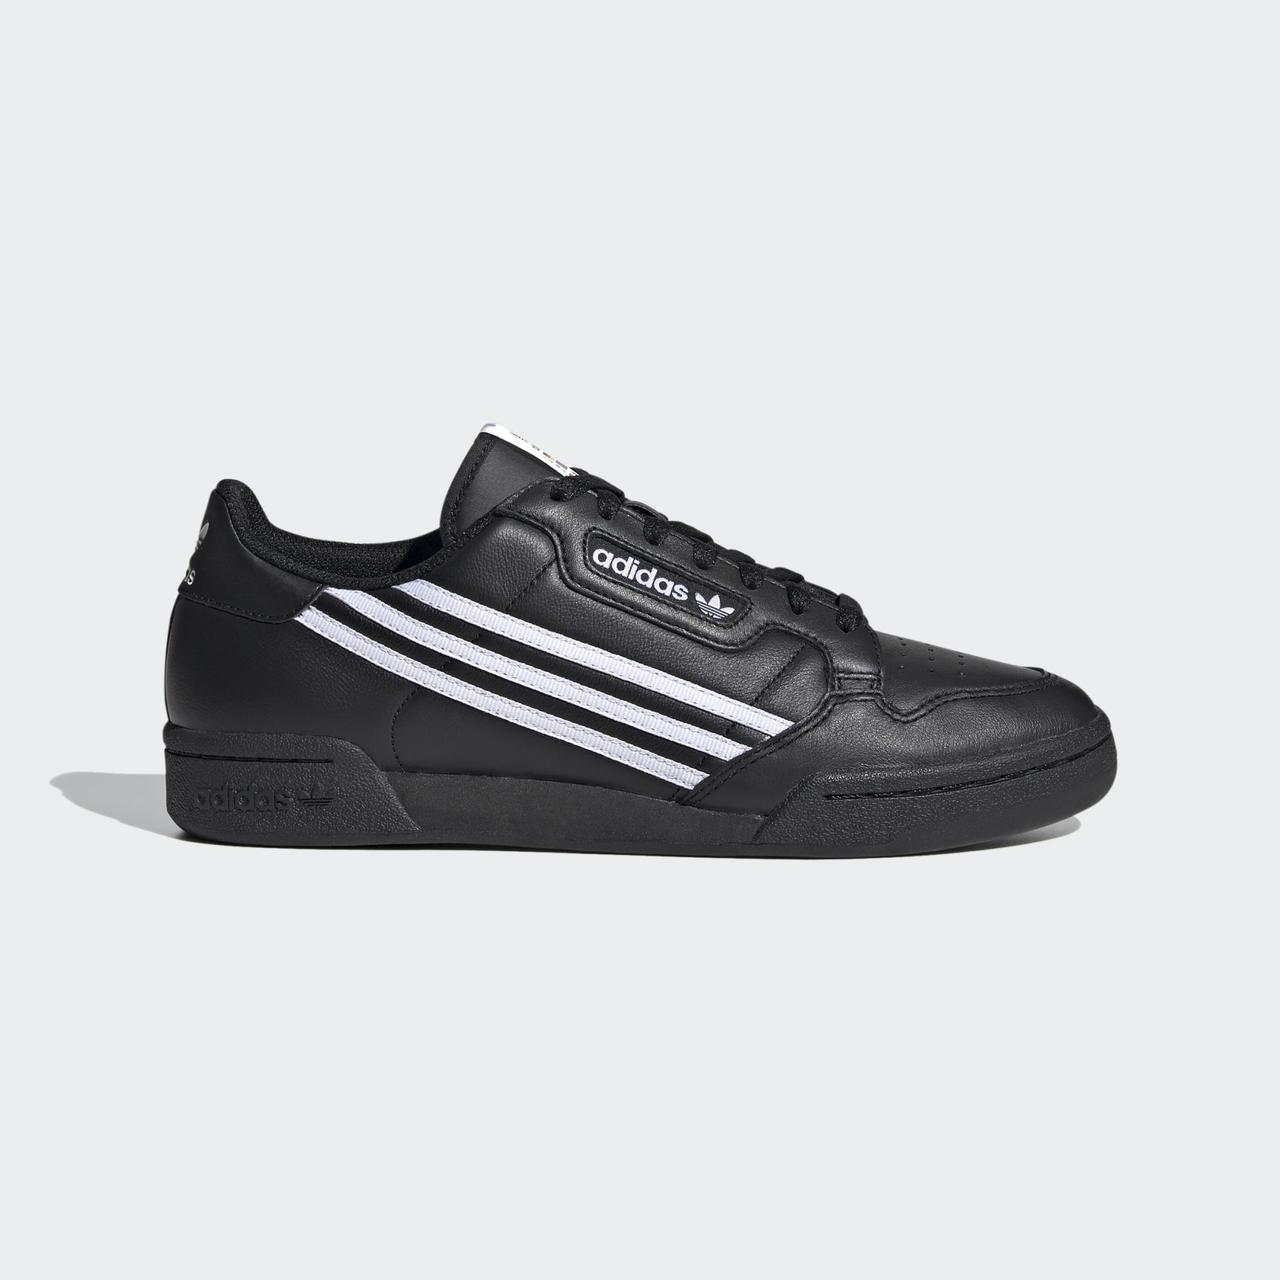 Кроссовки Adidas Continental 80 FU9779